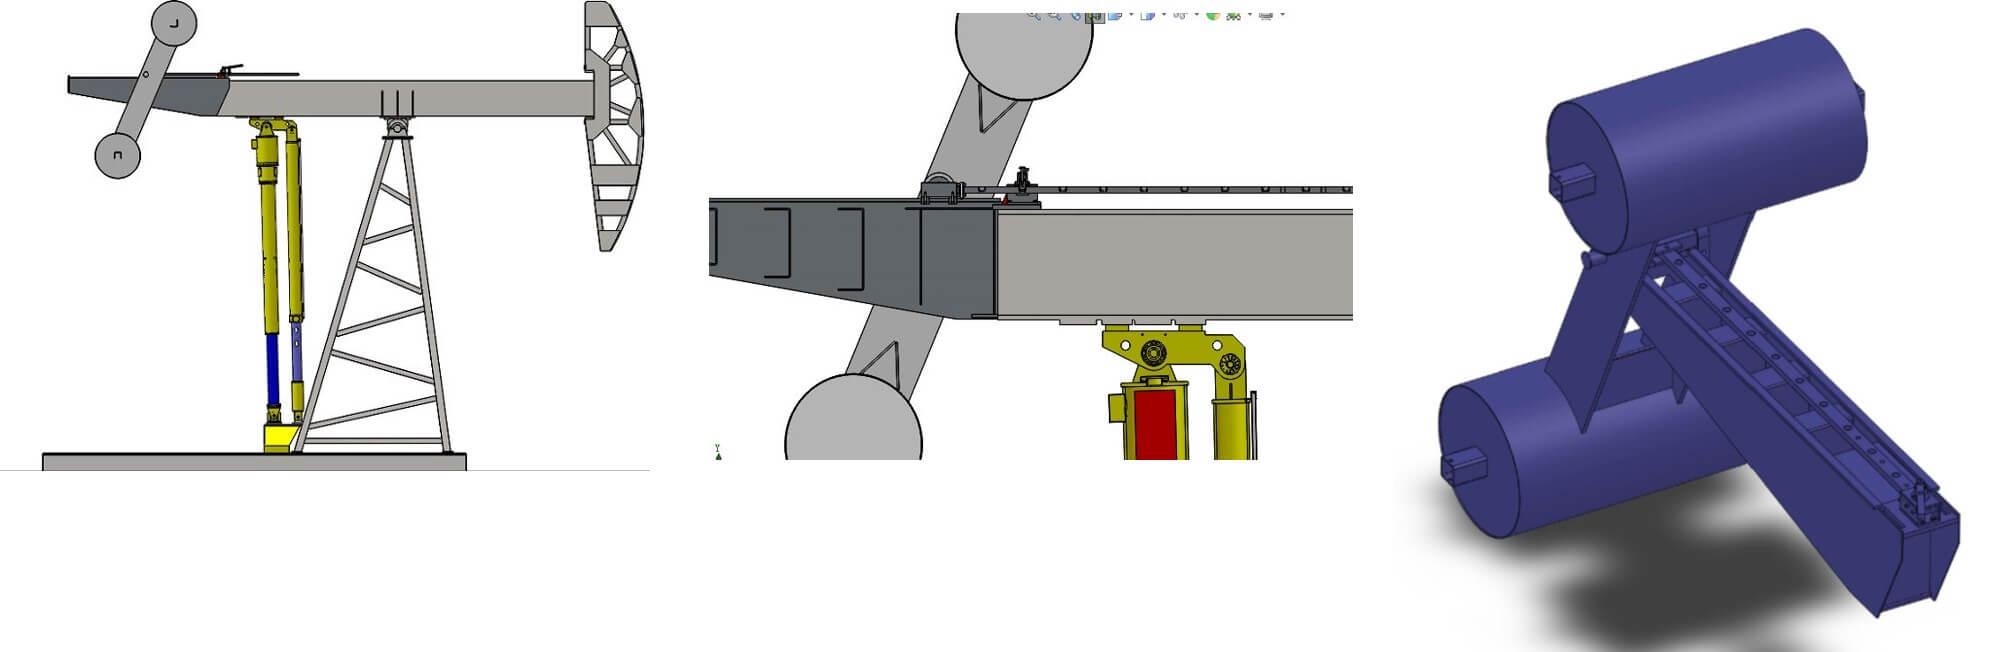 balance adjustment structure